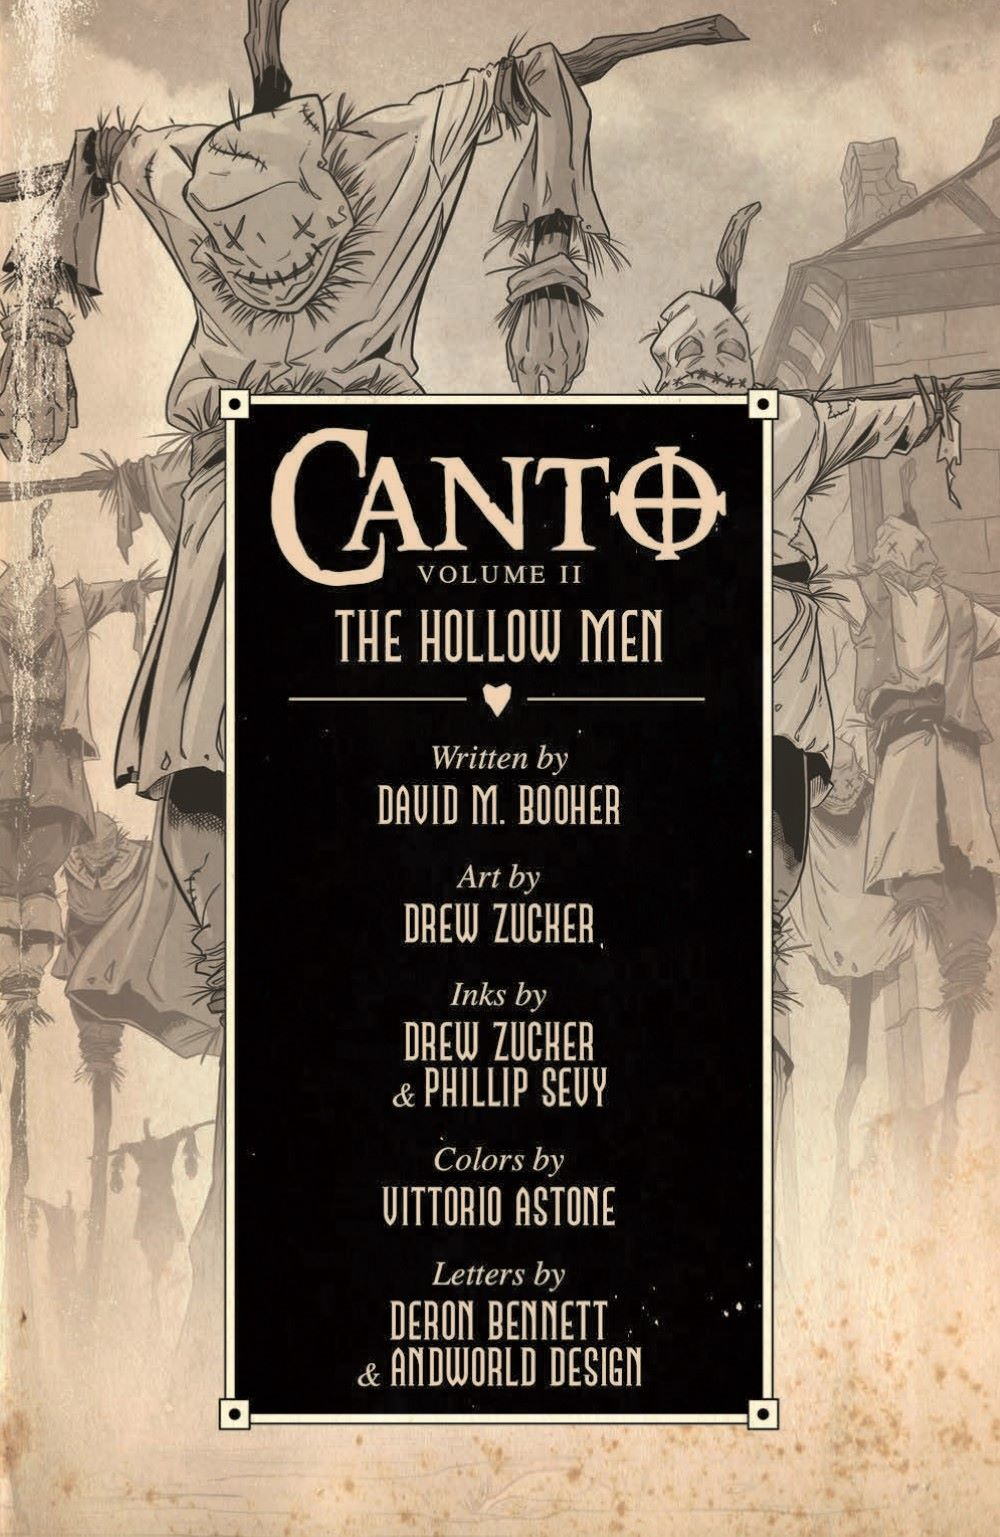 CANTOTPB02_pr-3 ComicList Previews: CANTO II THE HOLLOW MEN TP